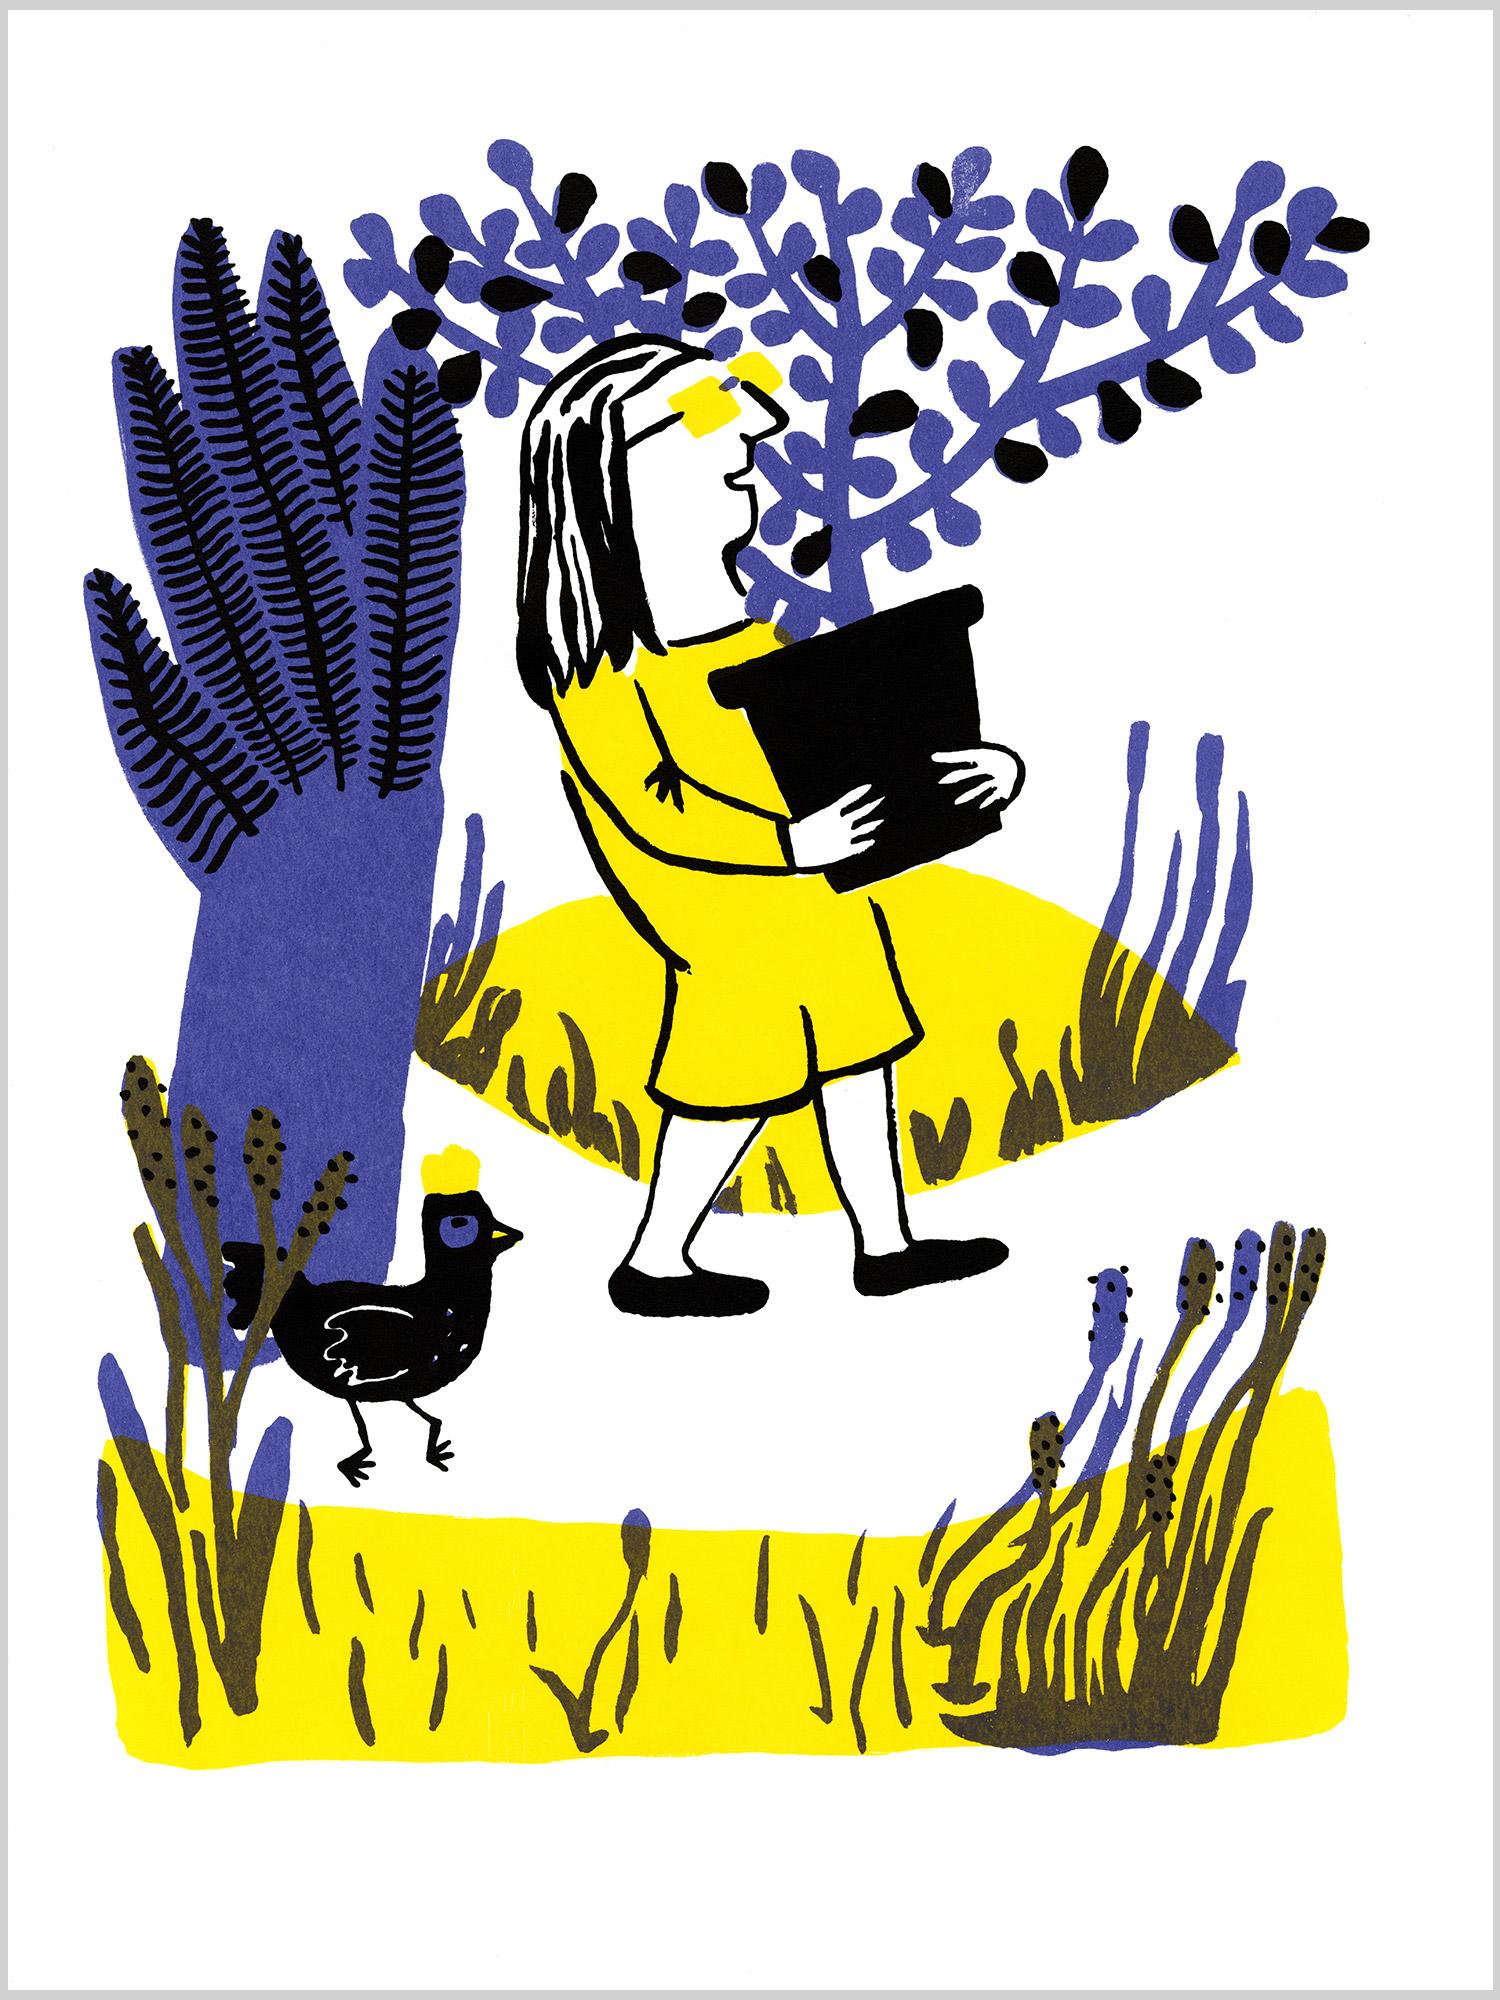 Mon amie Poulette 01 © Magali Bardos sérigraphie affiche silkscreen printing poster jaune violet noir yellow black